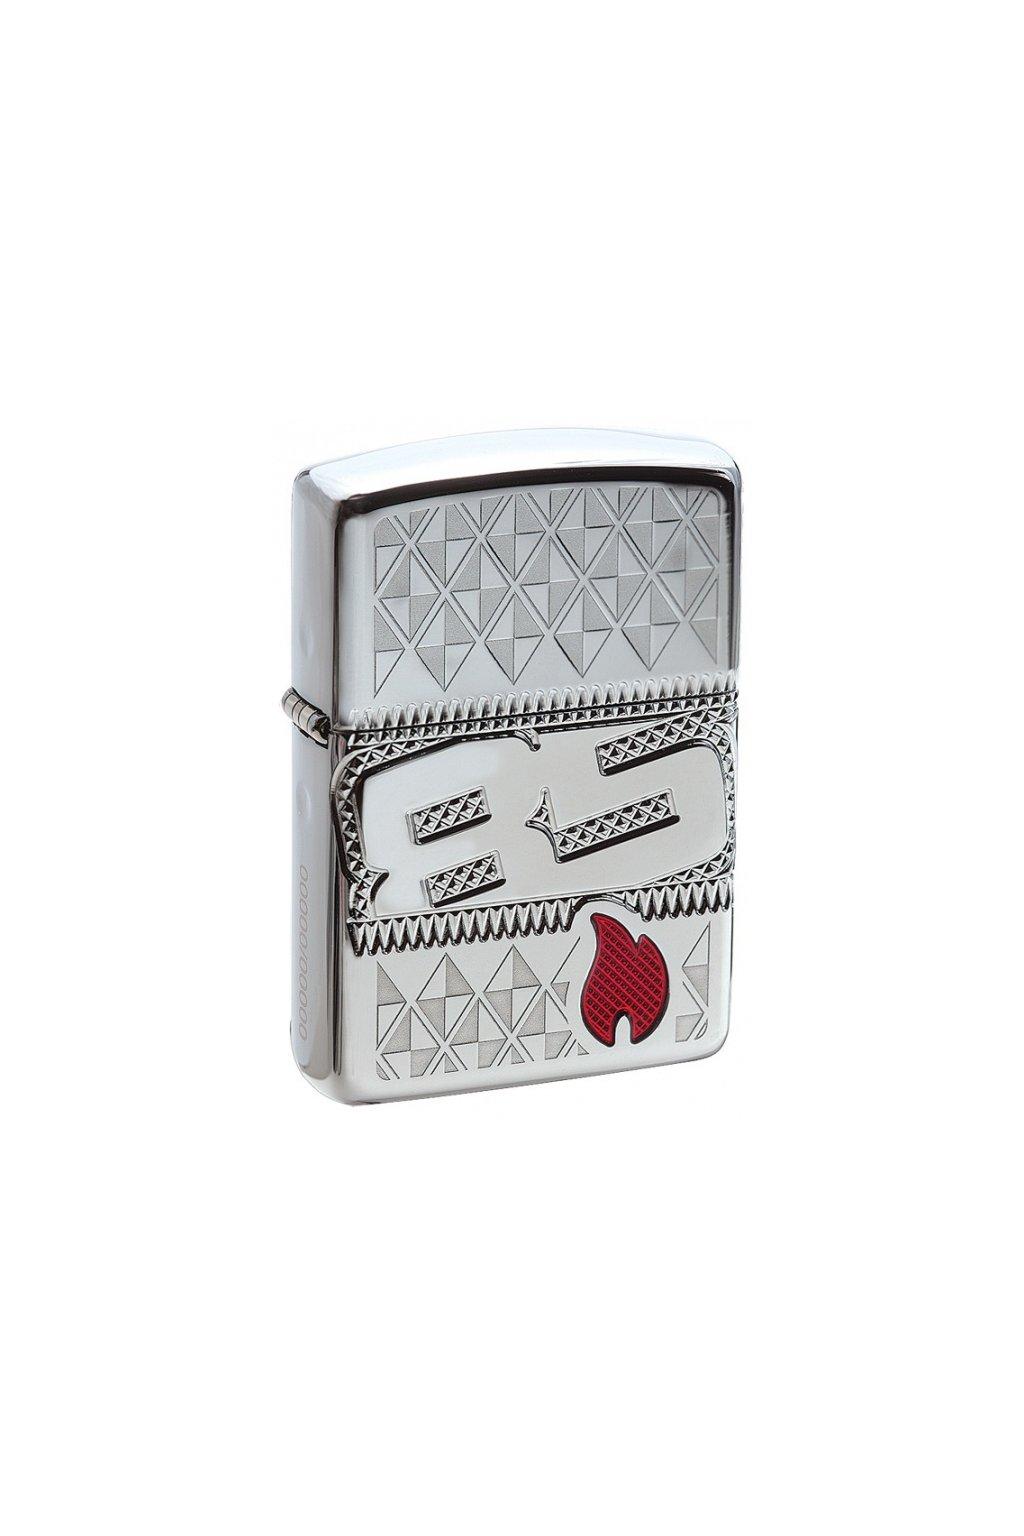 93269 zippo zapalovac 22022 zippo 85th anniversary